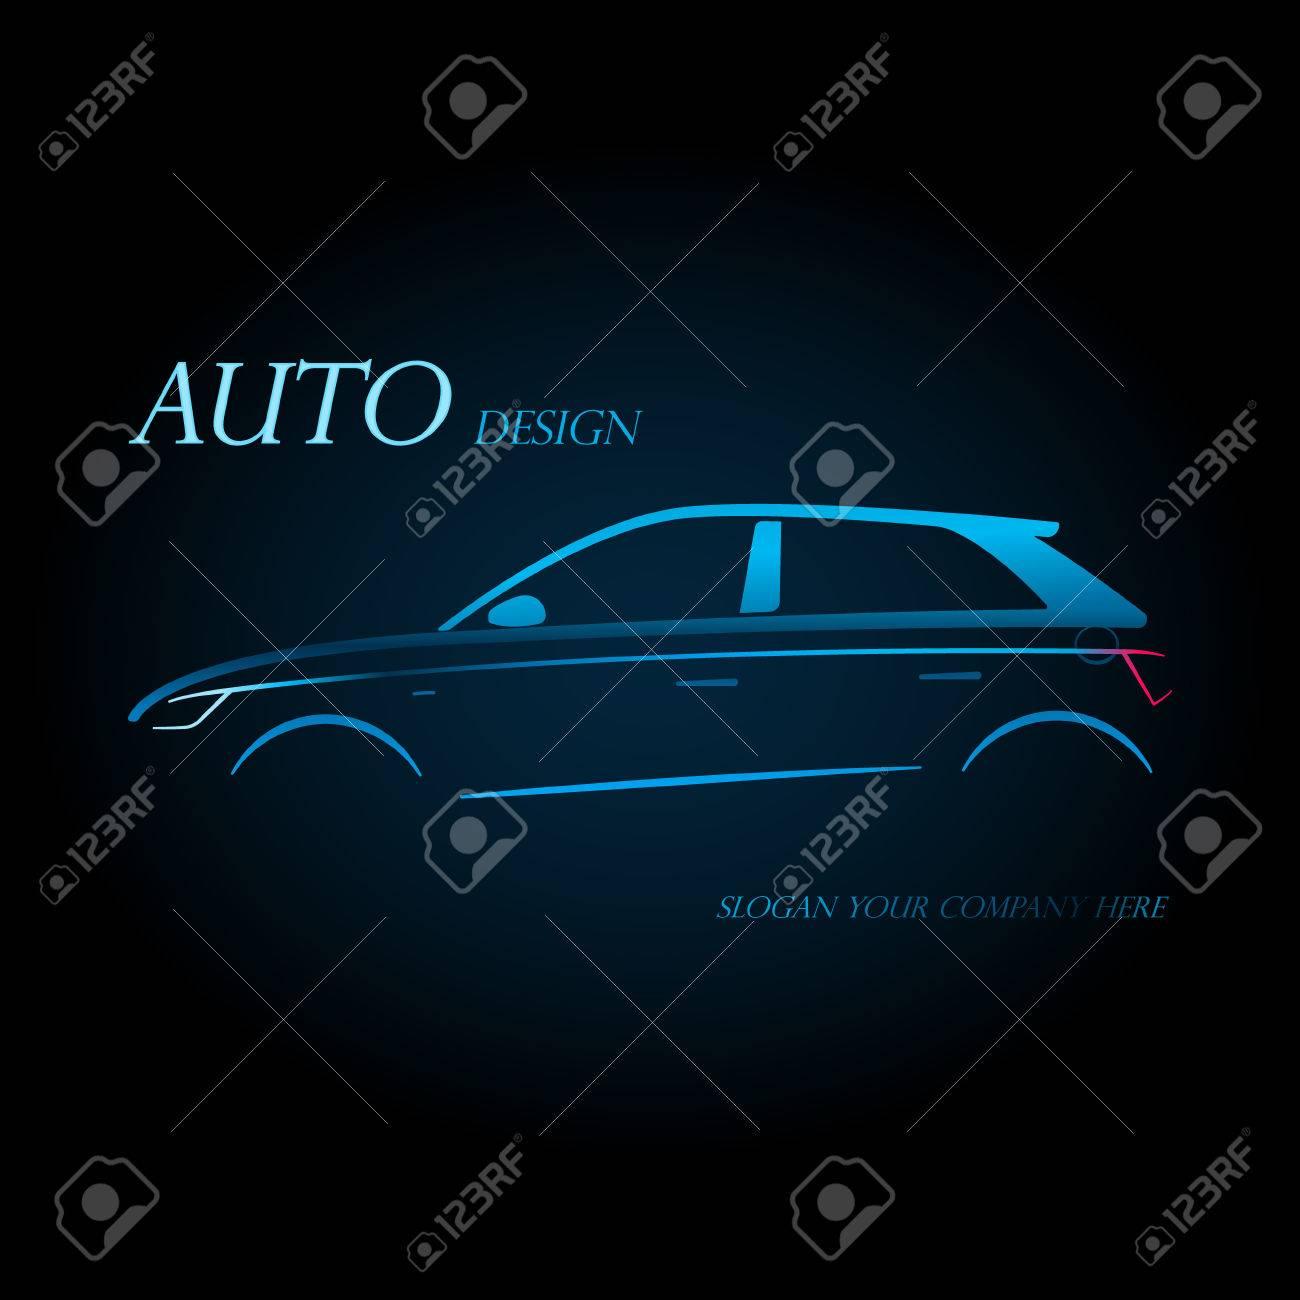 Car Insurance Car Logos Quiz Answers Pop Quiz Find Out Which Car